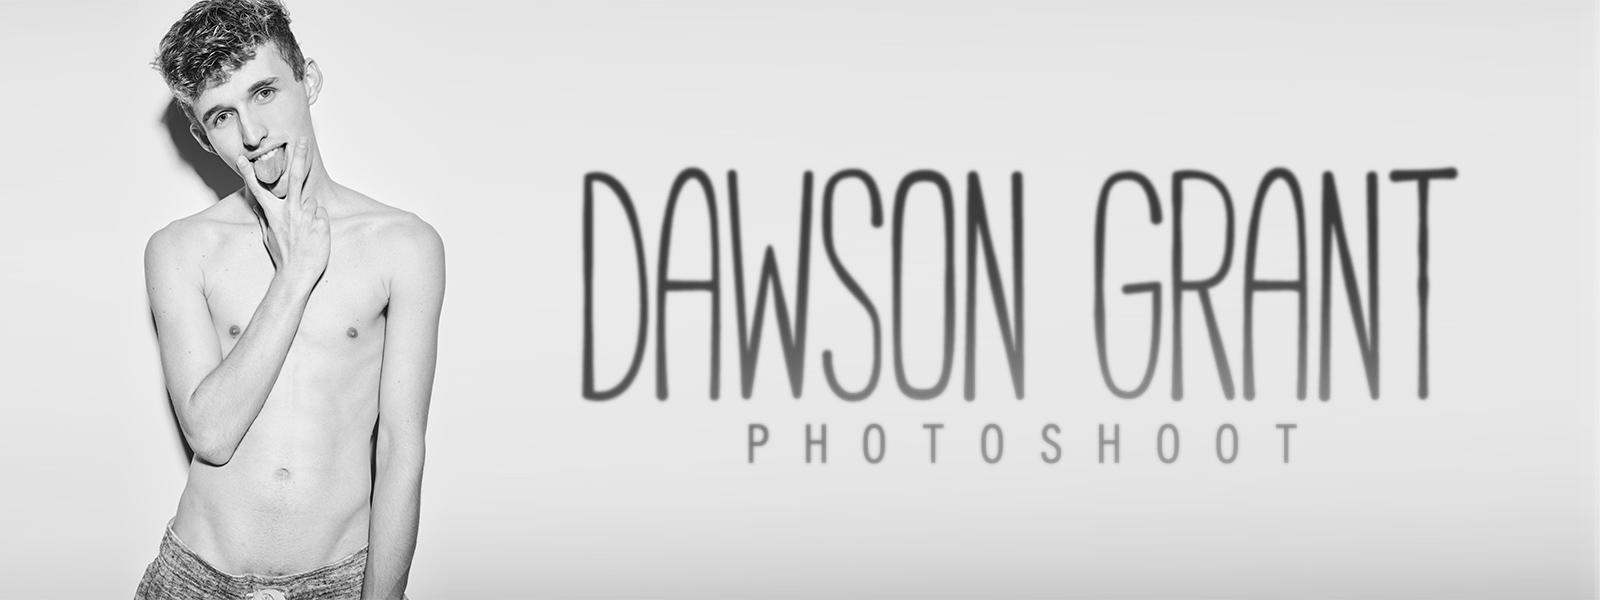 Dawson Grant Photoshoot